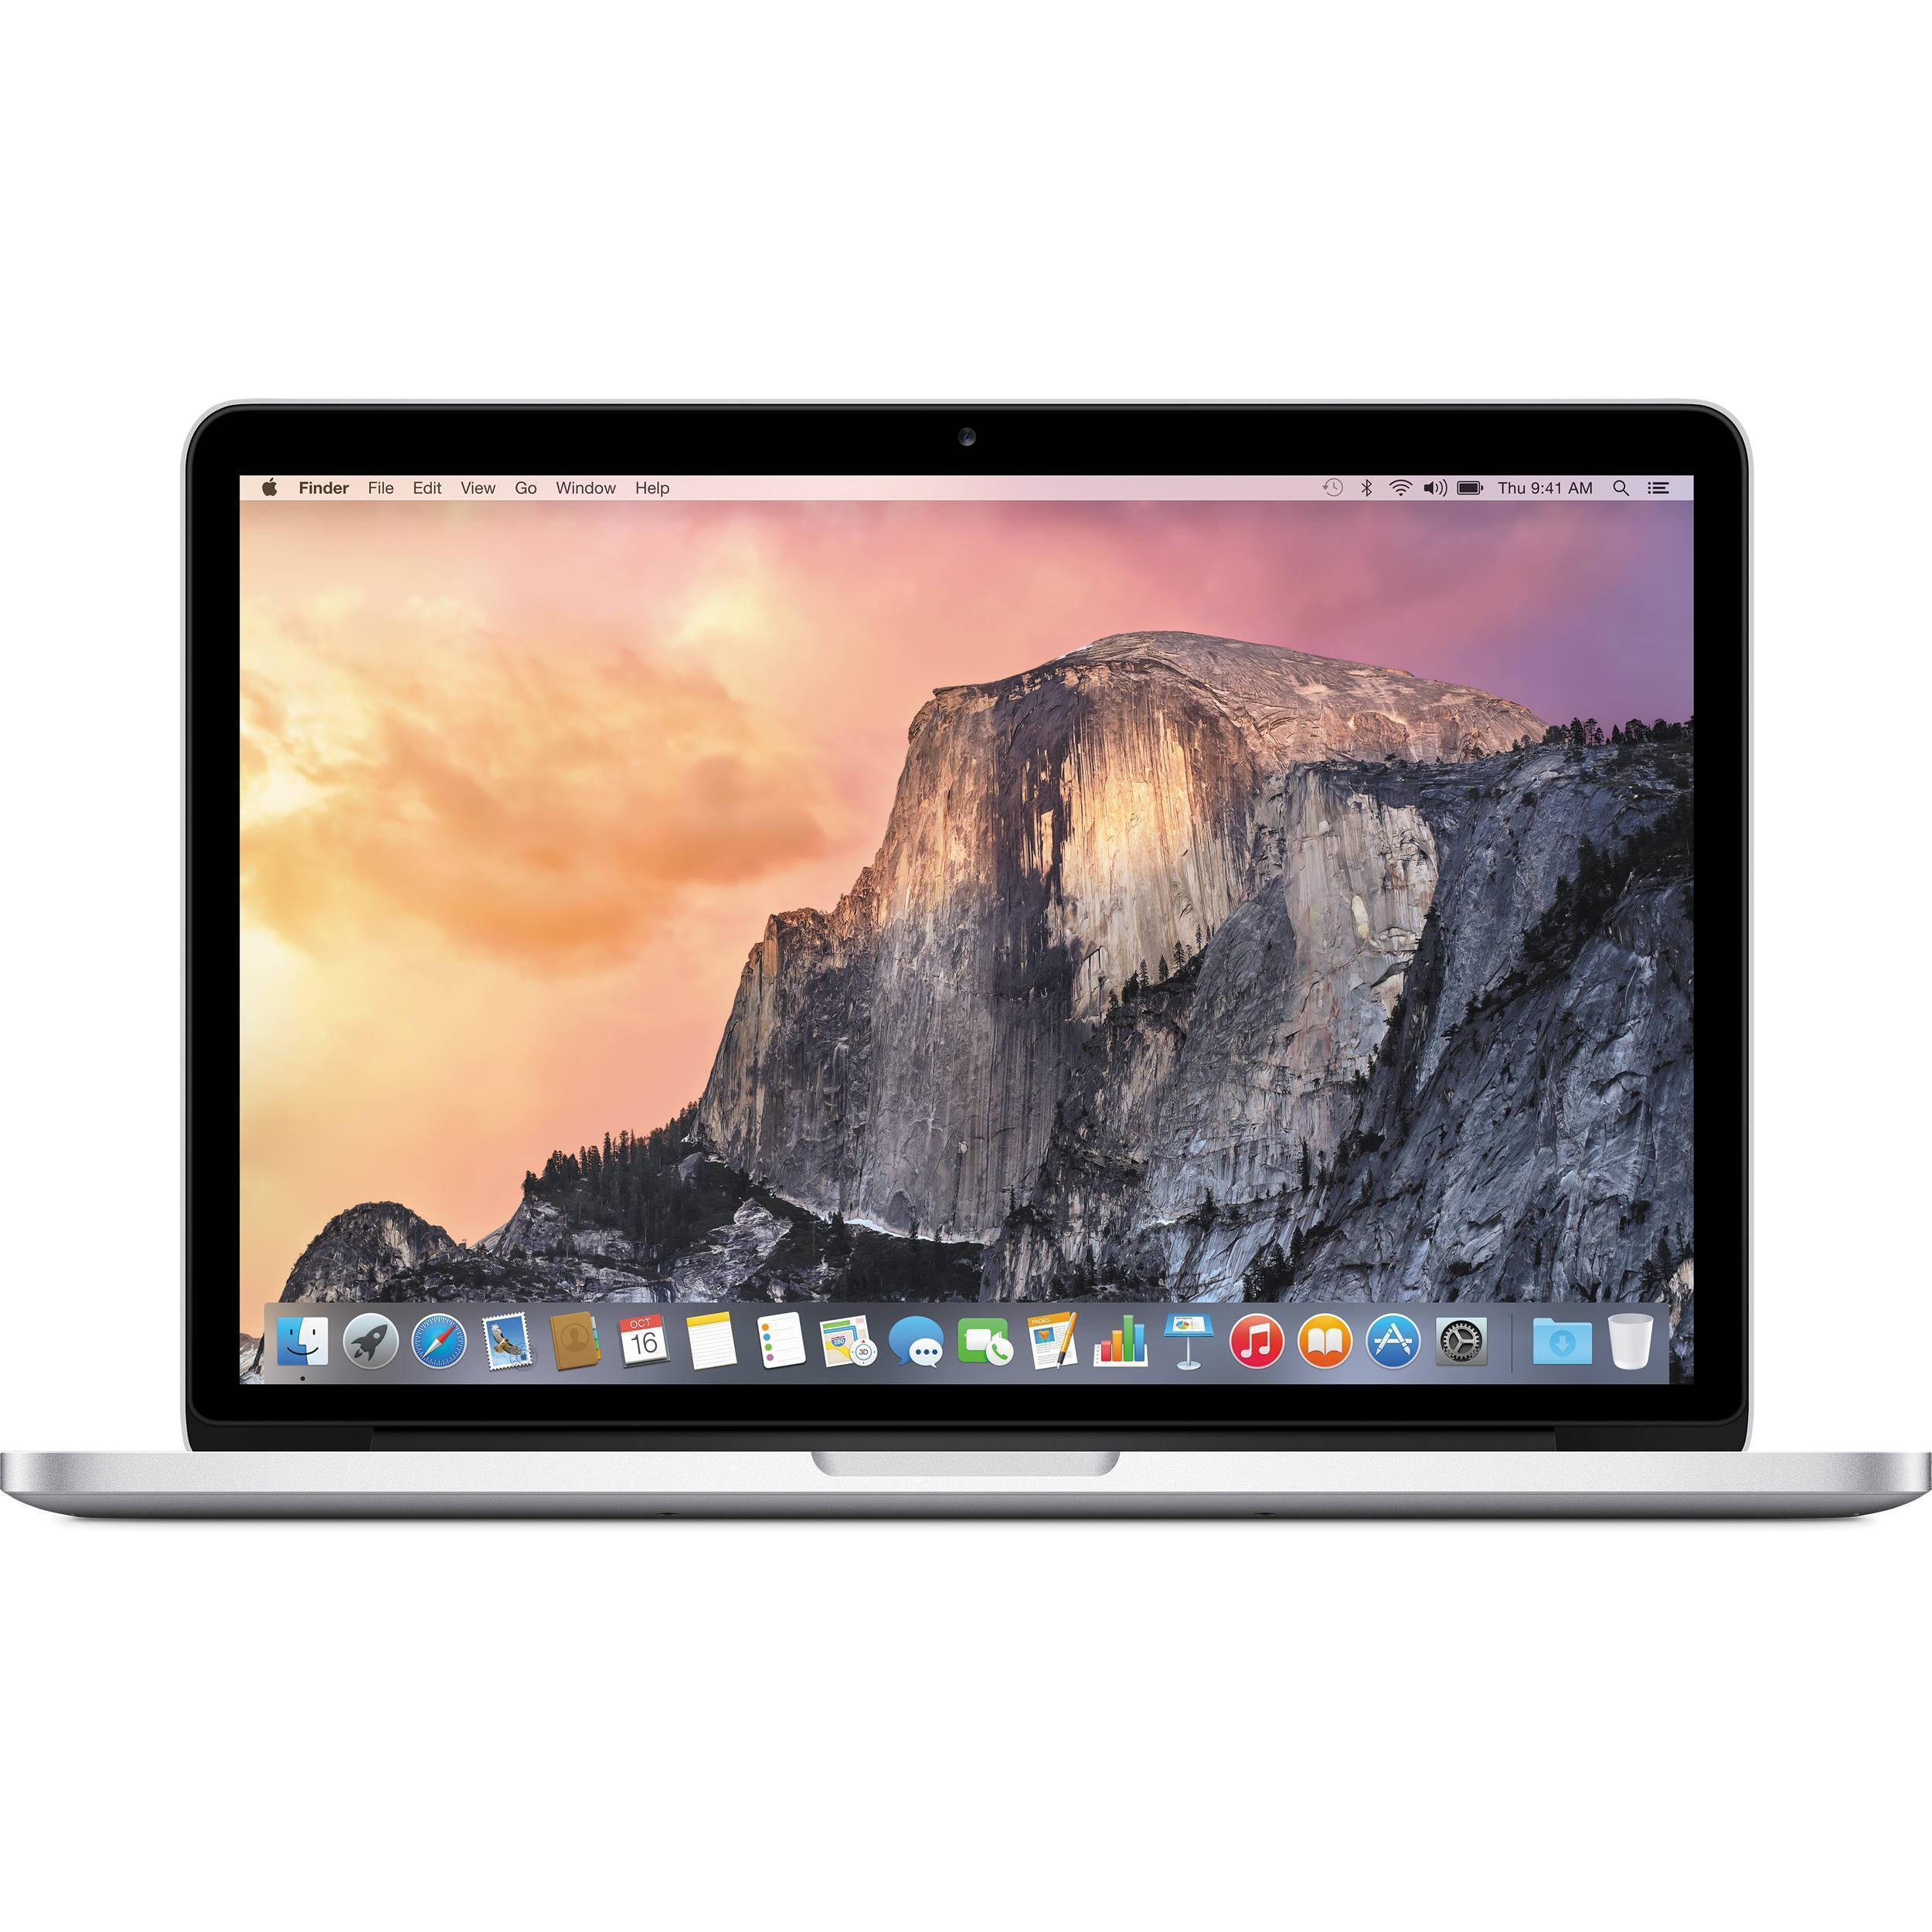 MacBook Pro Retina 13,3-inch (2012) - Core i5 - 4GB - SSD 128 GB QWERTZ - Alemão